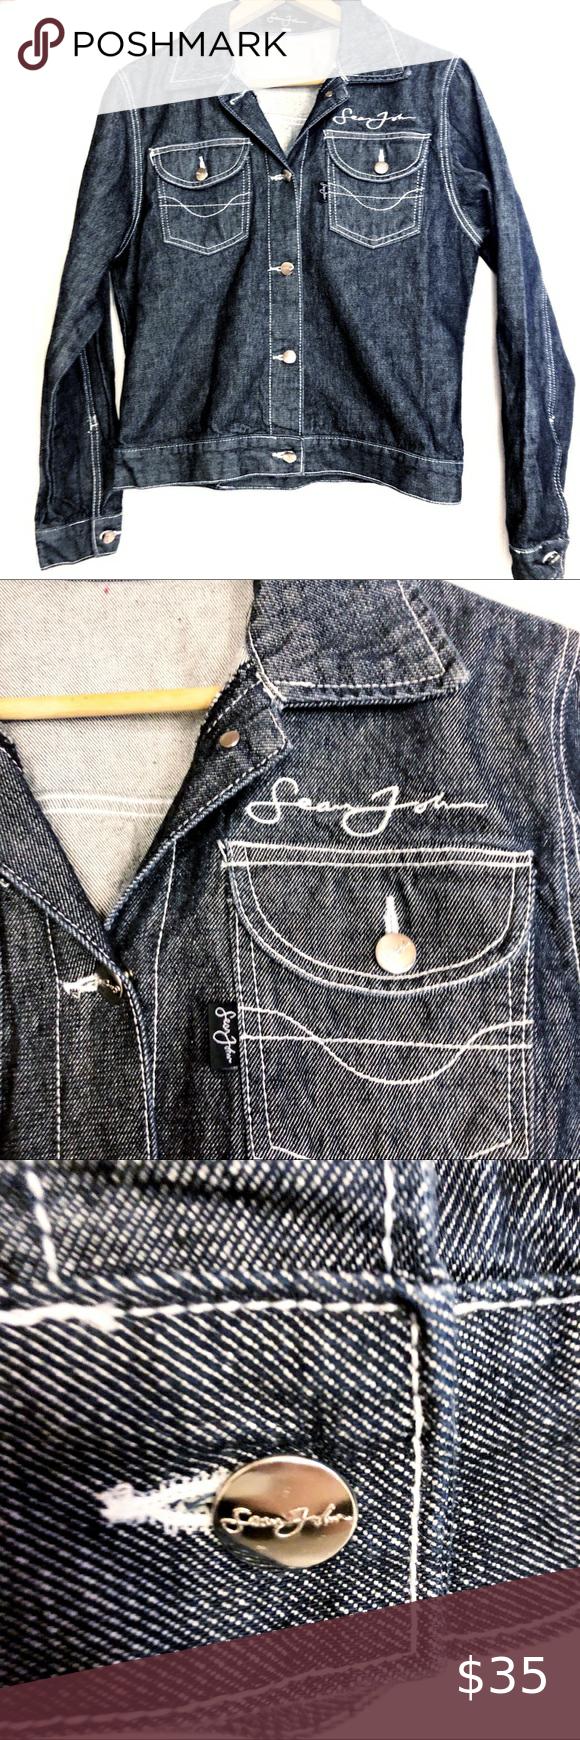 Sean John Denim Jean Jacket Button Front Md Sean John Dark Wash Denim Jean Jacket Button Front Sean Vintage Denim Jacket Denim Jean Jacket Grey Denim Jacket [ 1740 x 580 Pixel ]